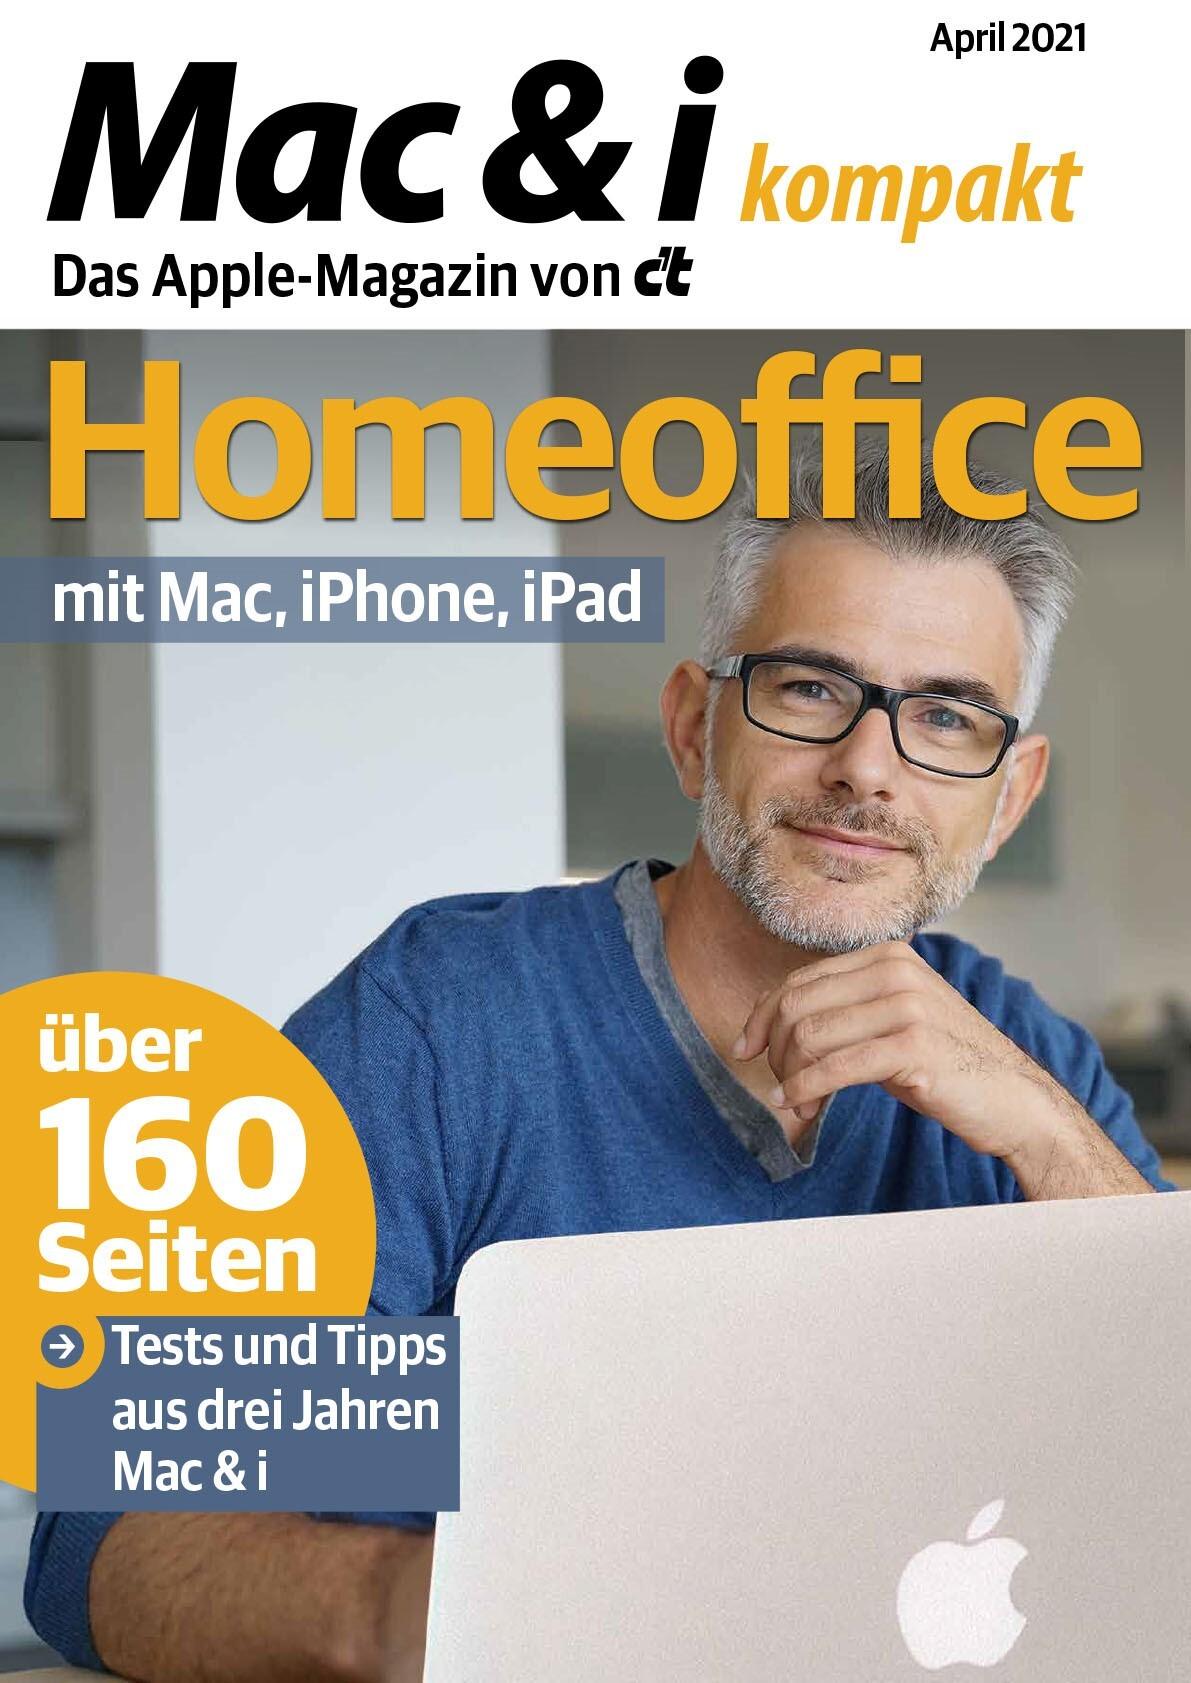 Mac & i kompakt - Homeoffice (PDF)